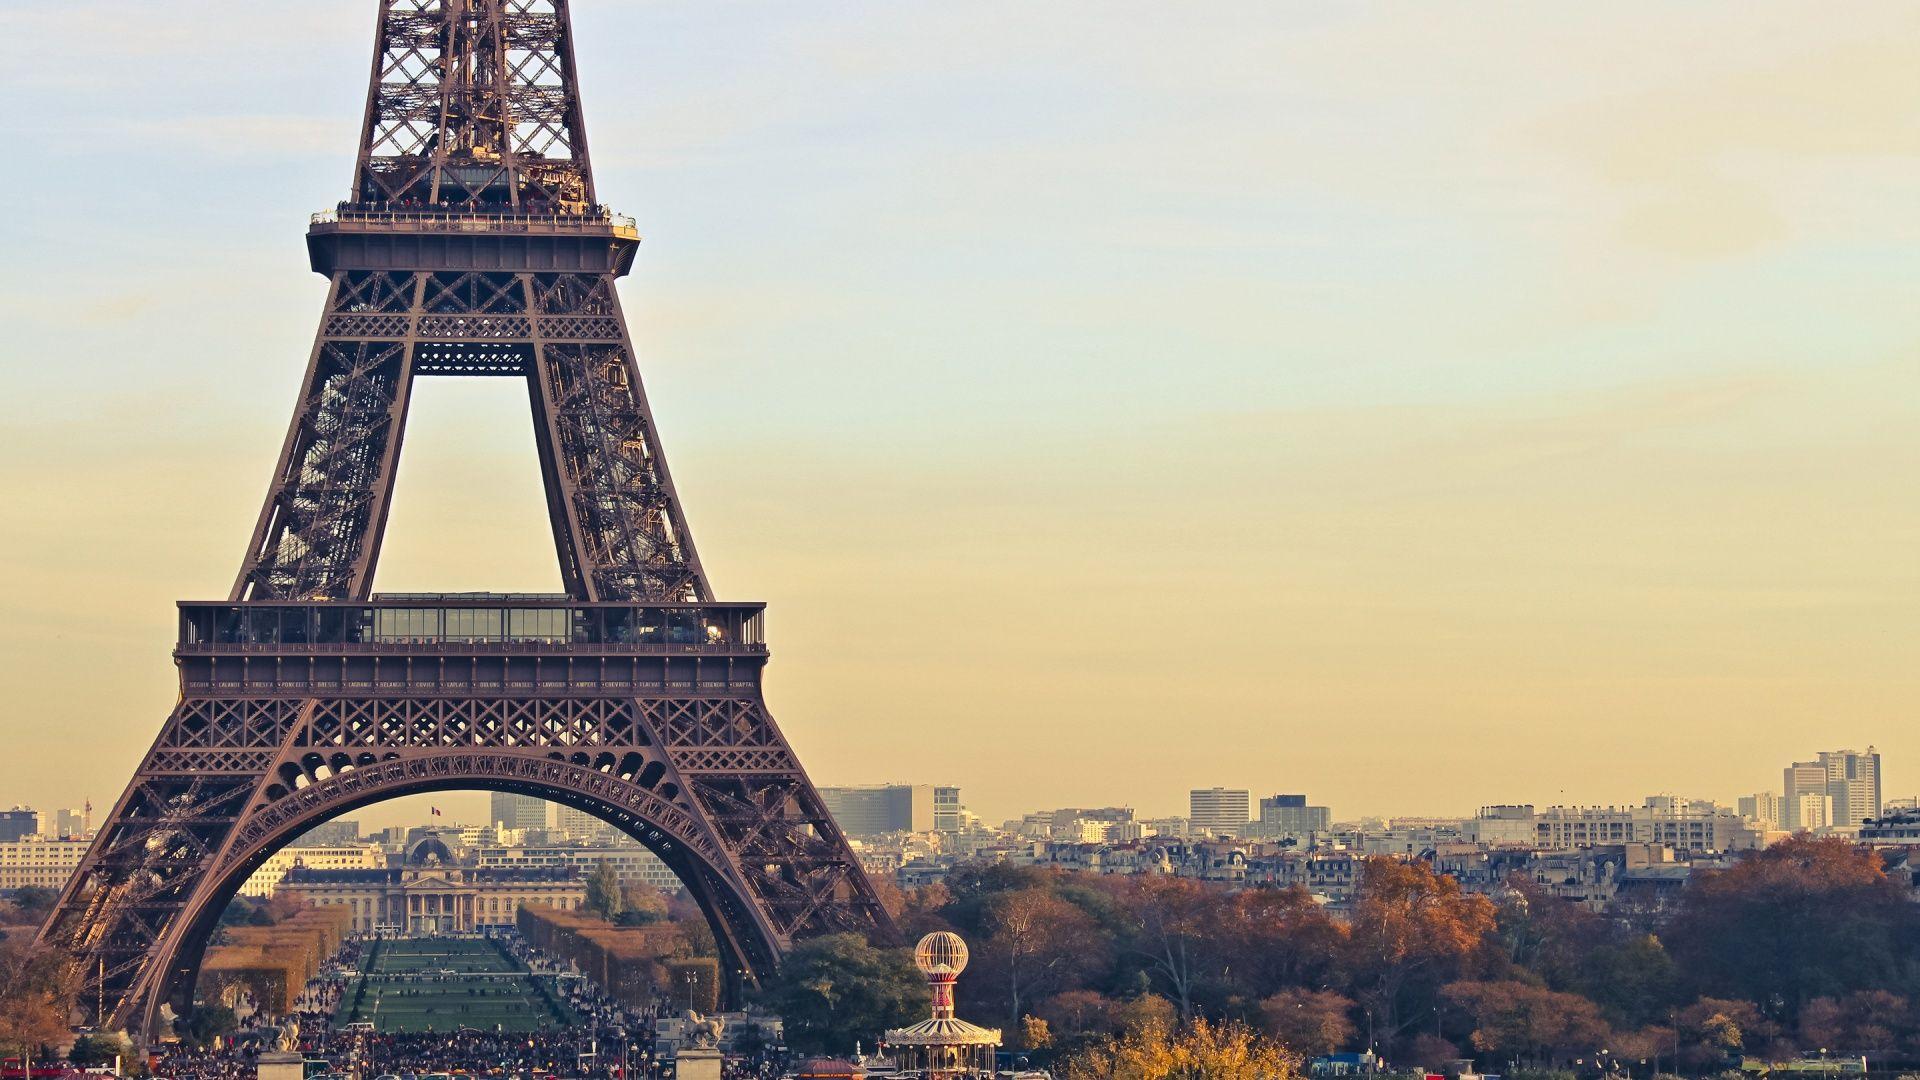 Hd wallpaper paris - Eiffel Tower Paris Full Hd Background Wallpapers